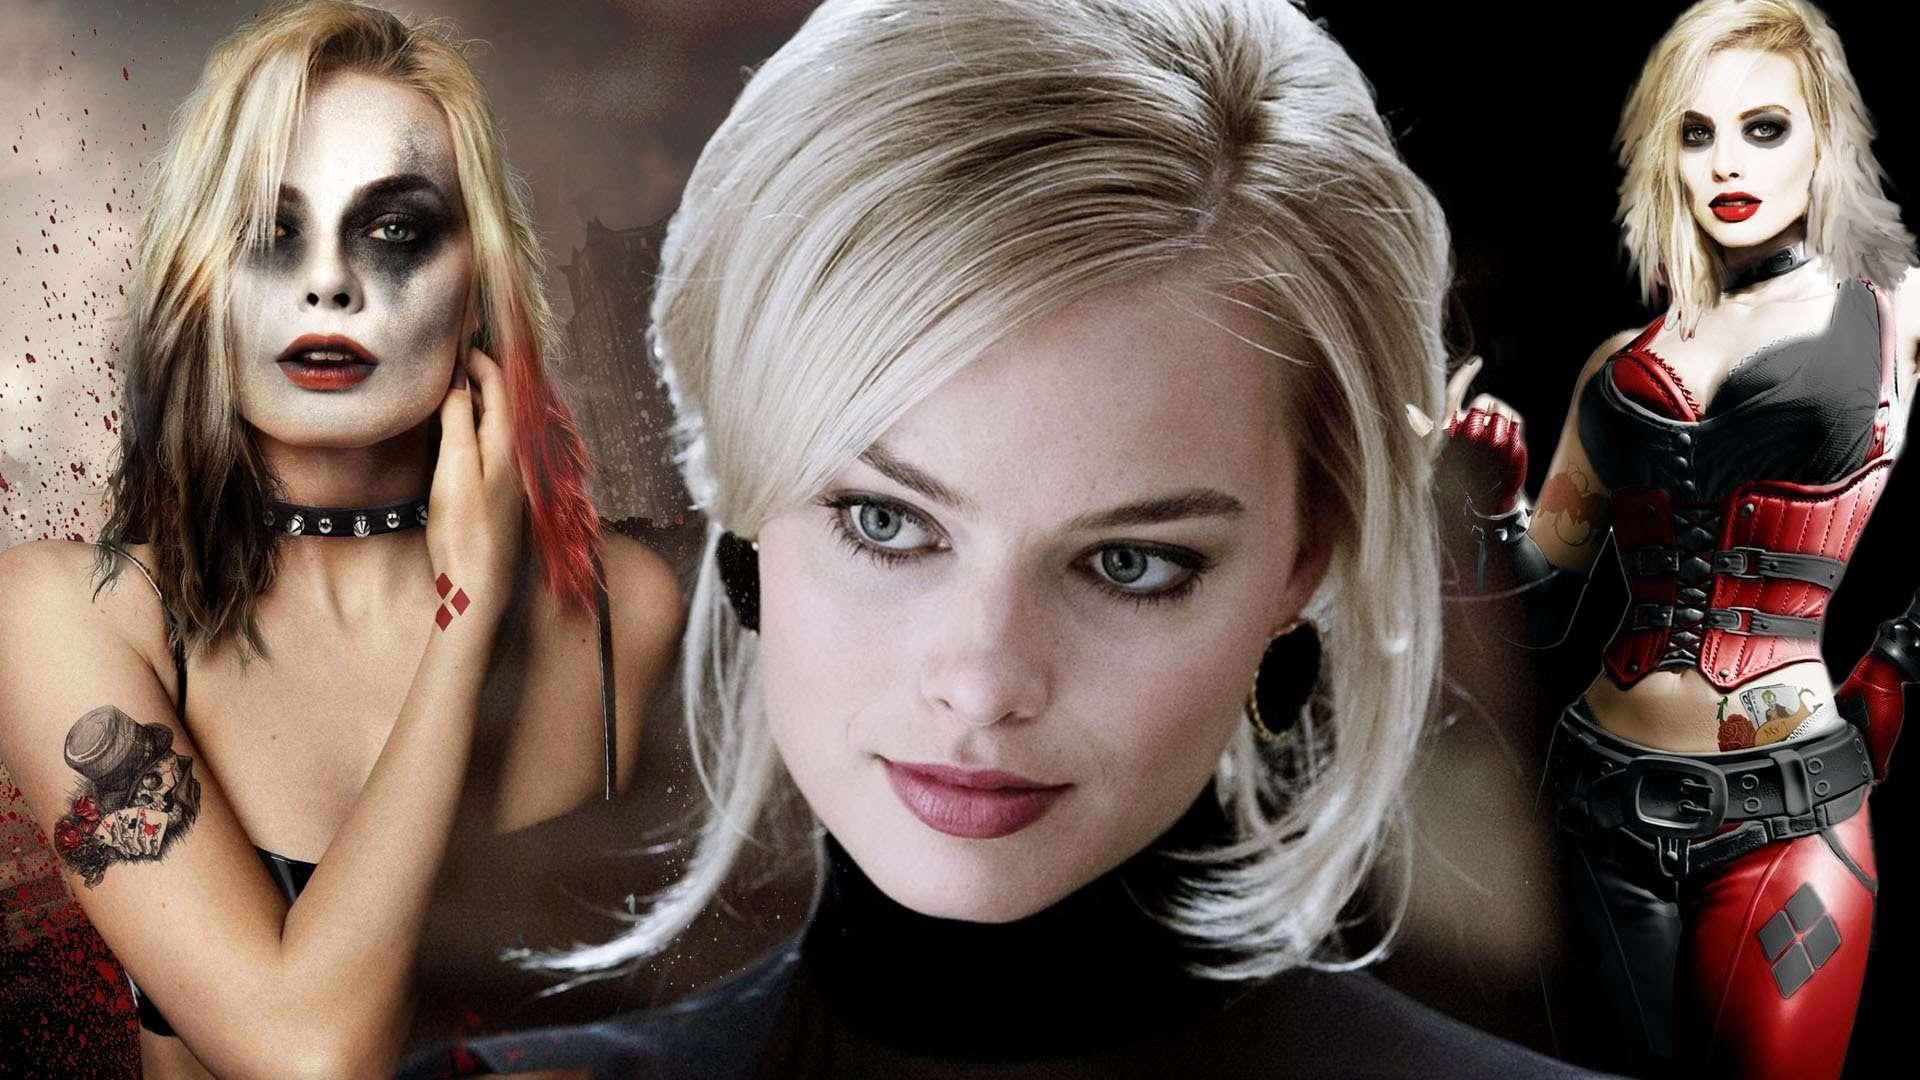 Wallpaper Hd Wallpaper Harley Quinn Suicide Squad 1080p Upload at 1920x1080